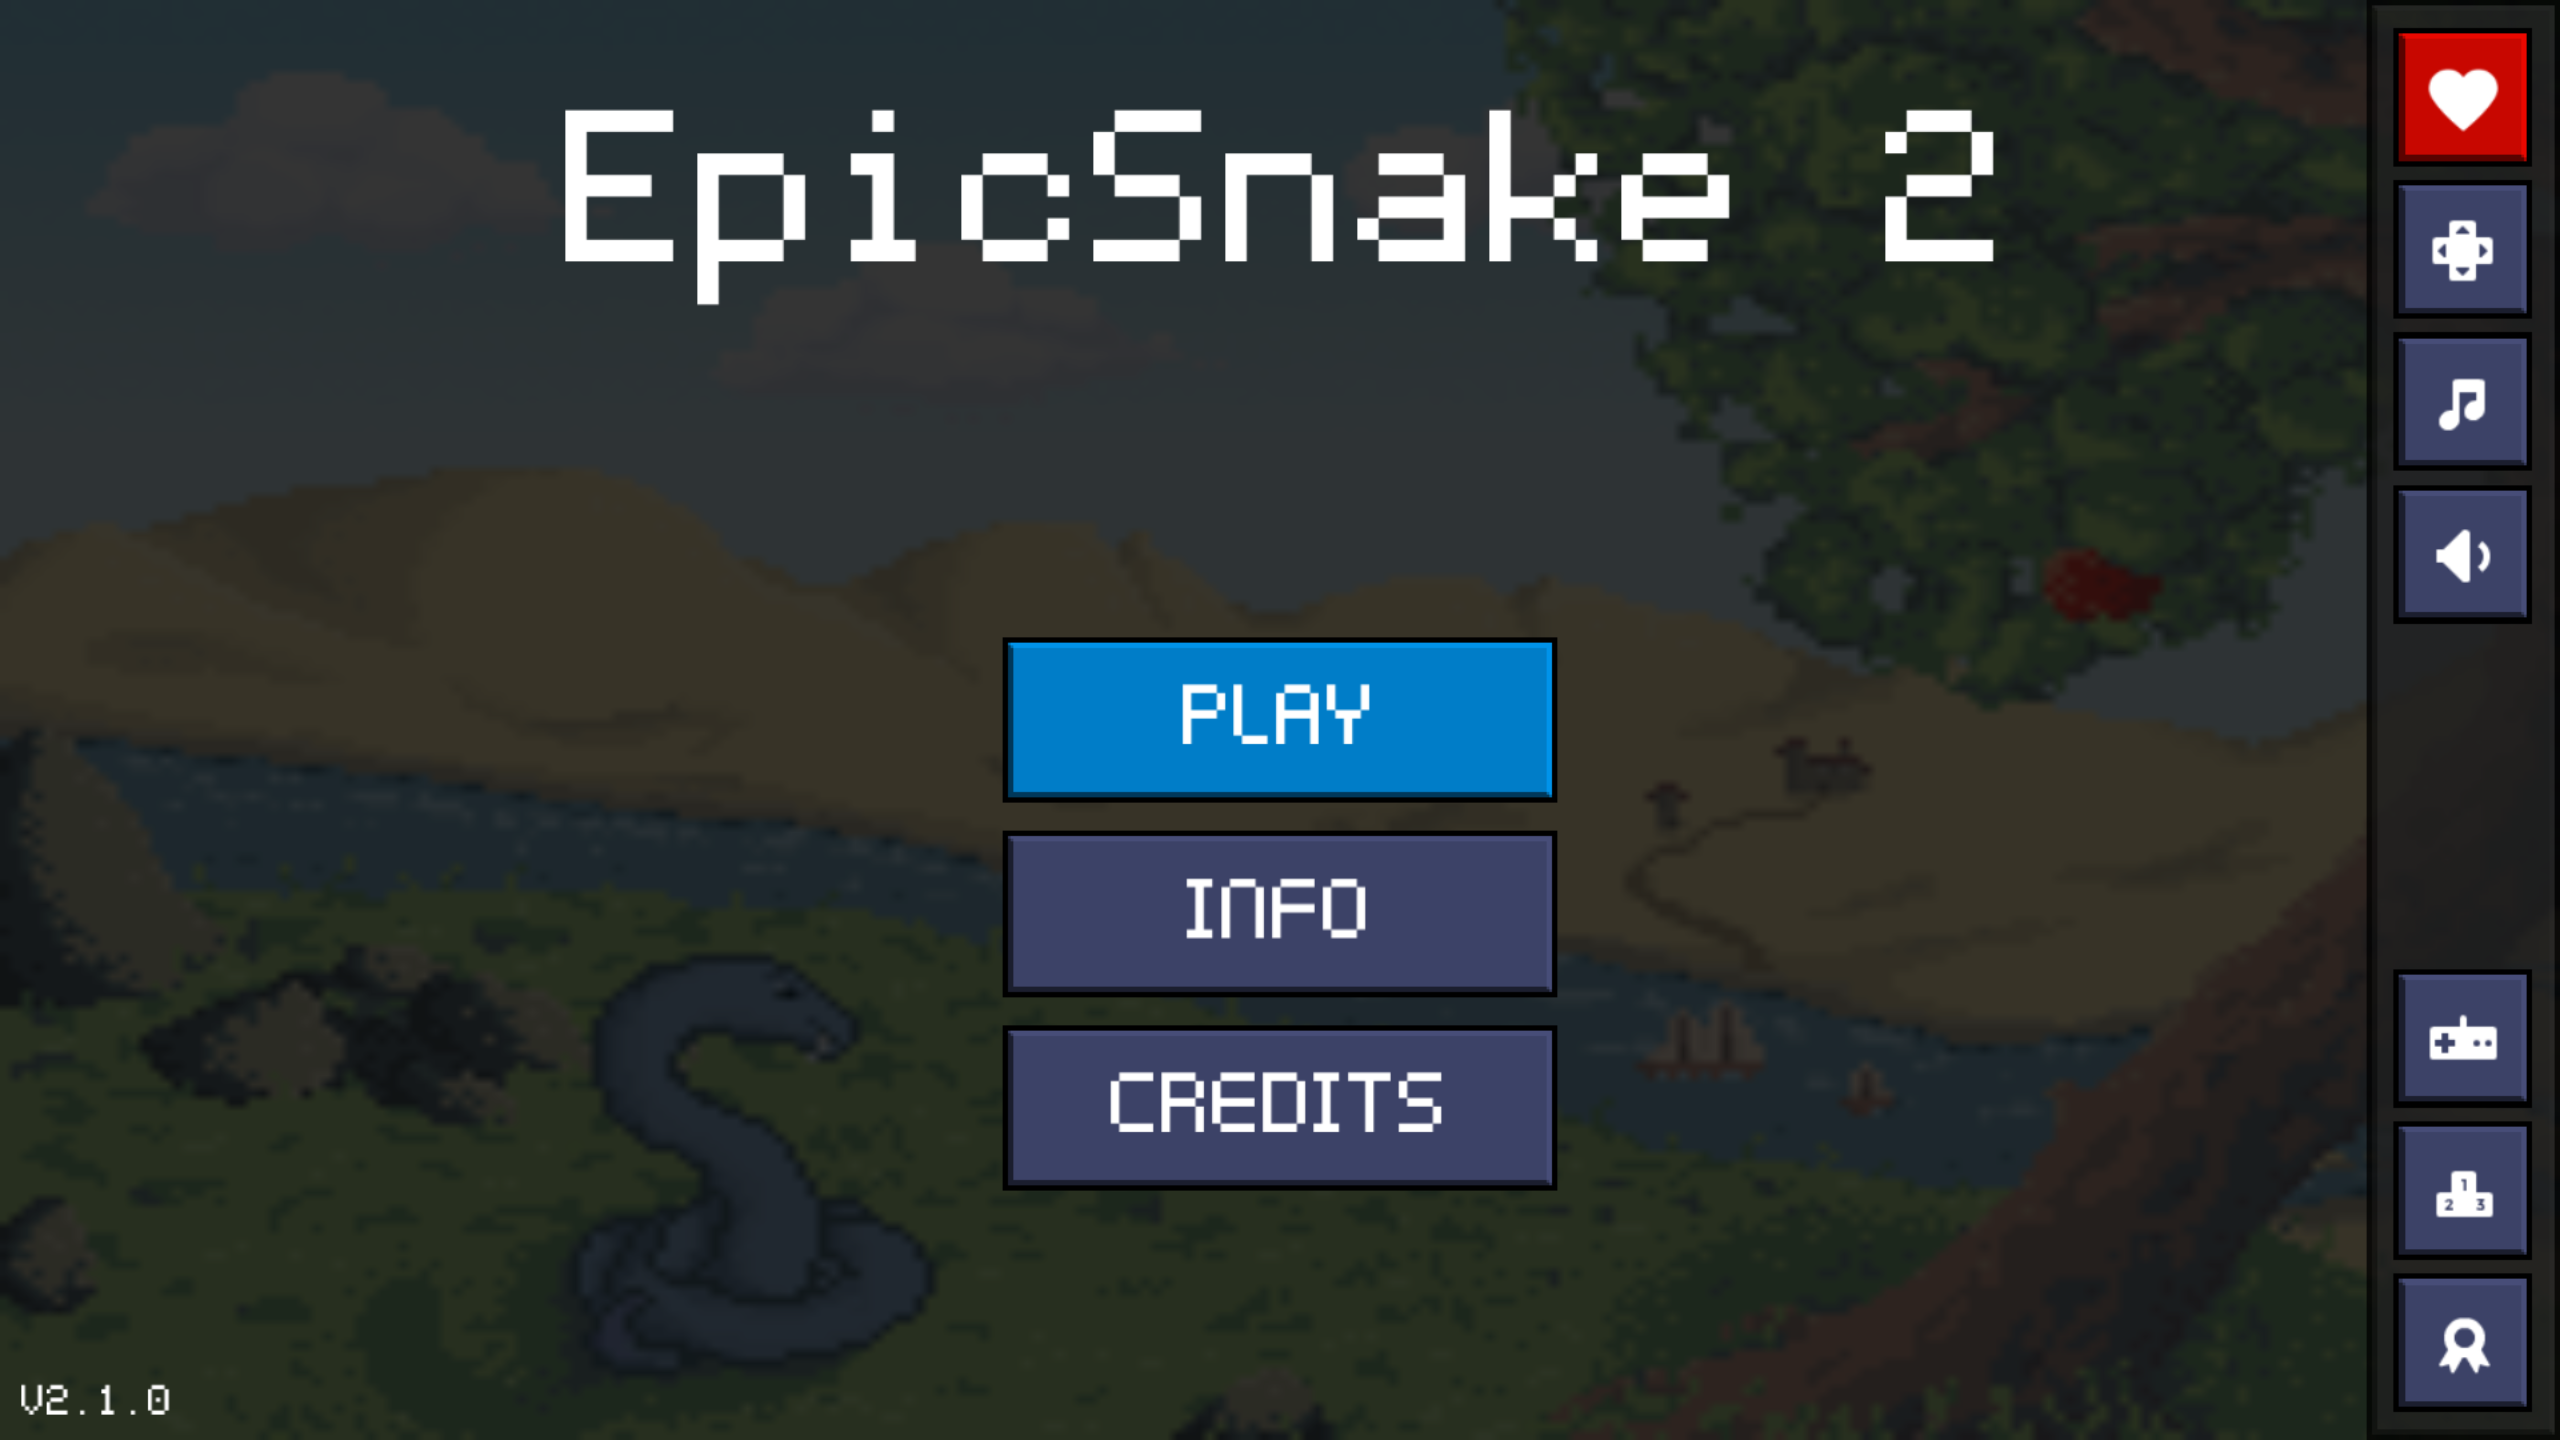 EpicSnake 2